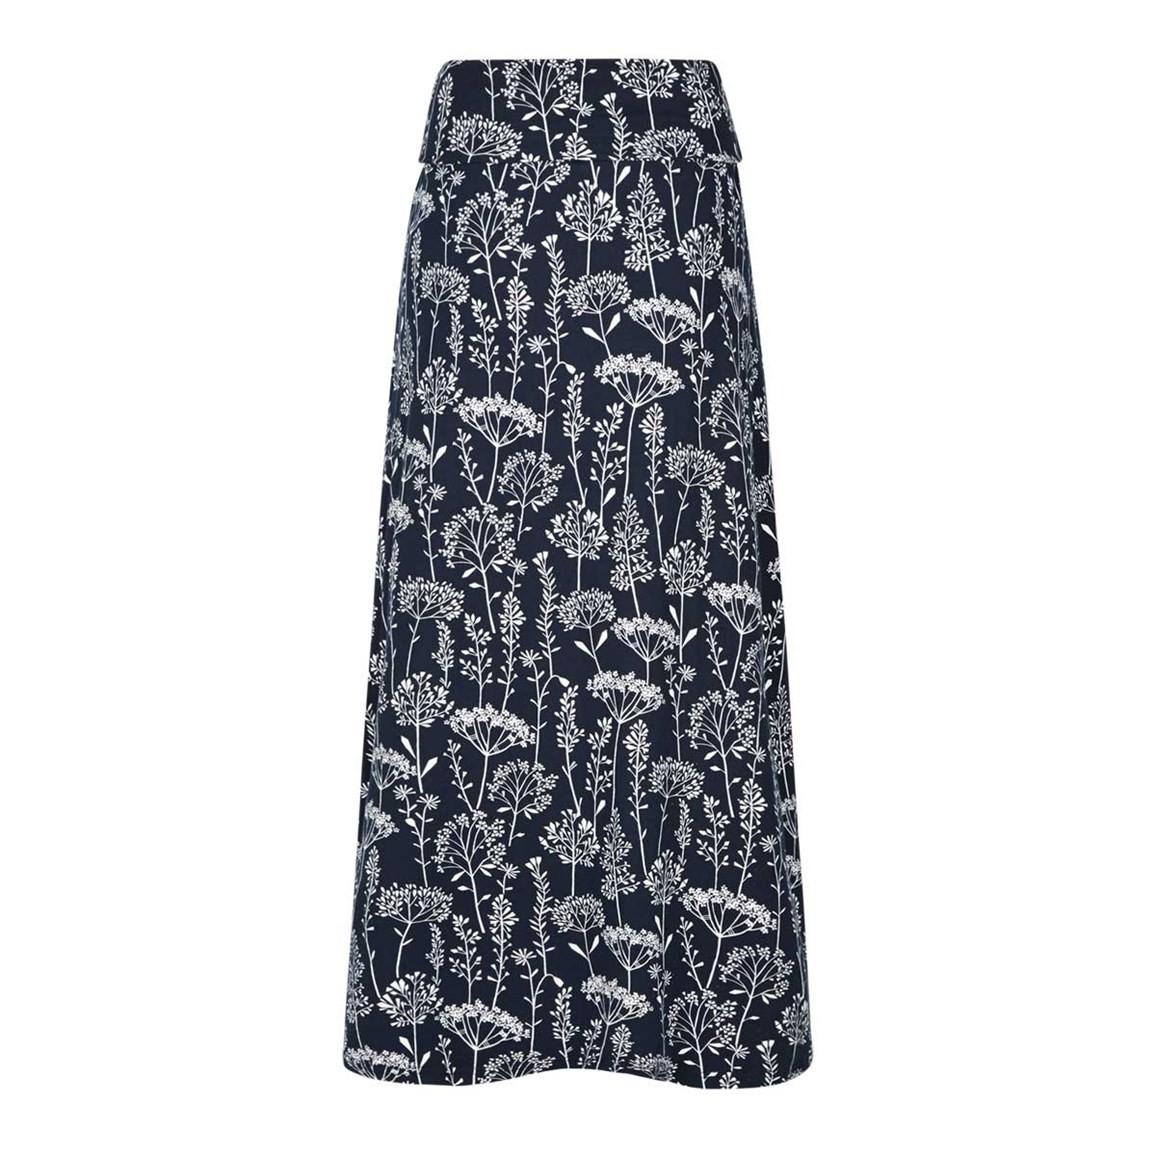 Suzette Printed Jersey Skirt Navy